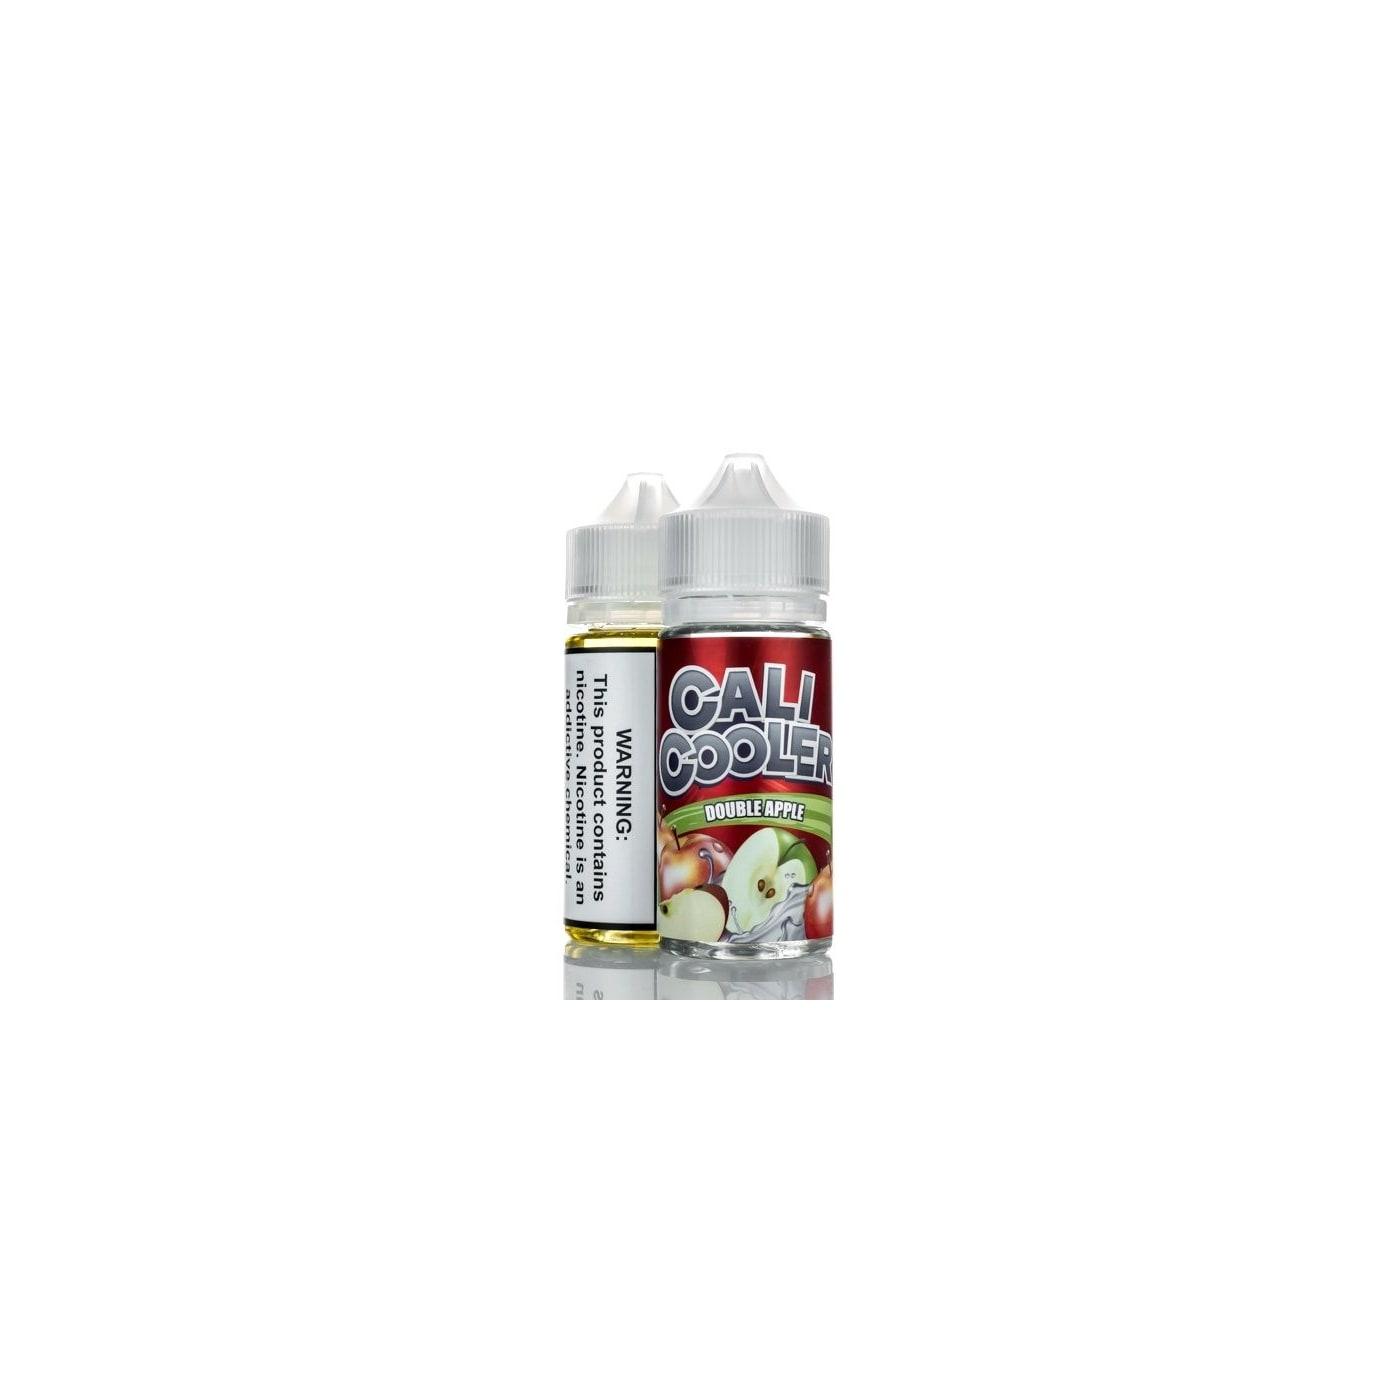 Cali Cooler Double Apple 100ml - The Mamasan E-Juice